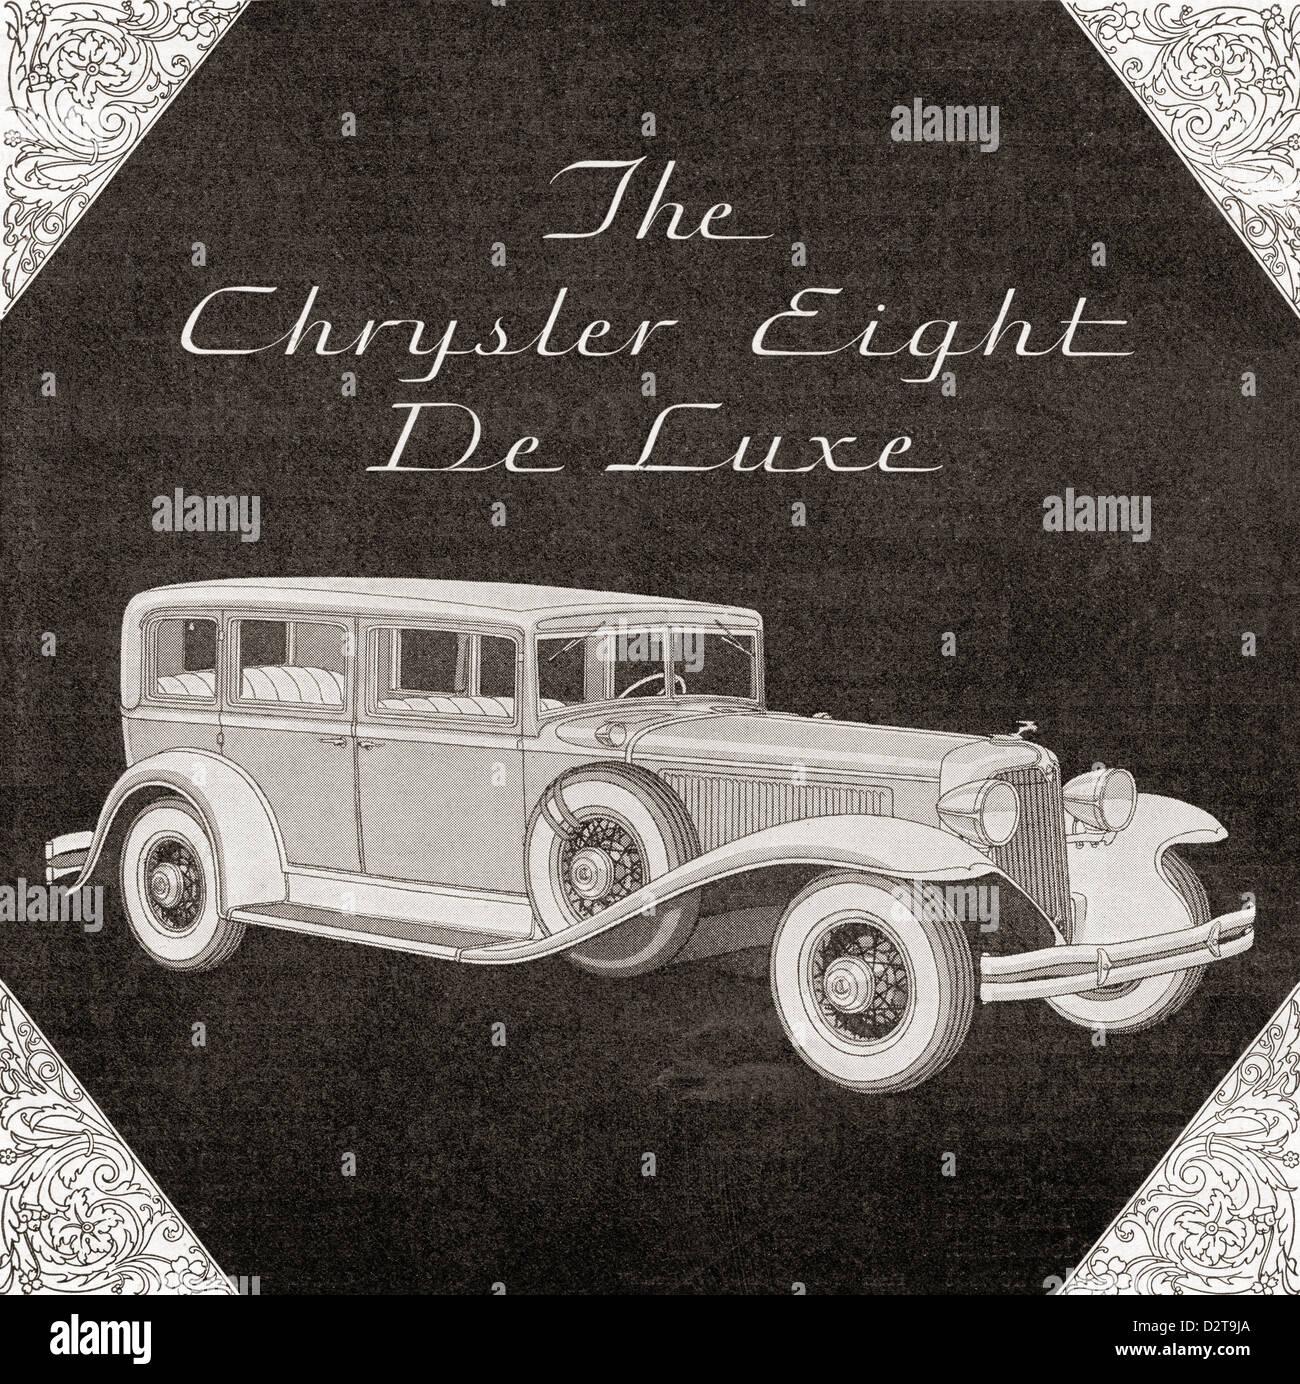 A 1930's advertisement for a Chrysler Eight De Luxe car. - Stock Image